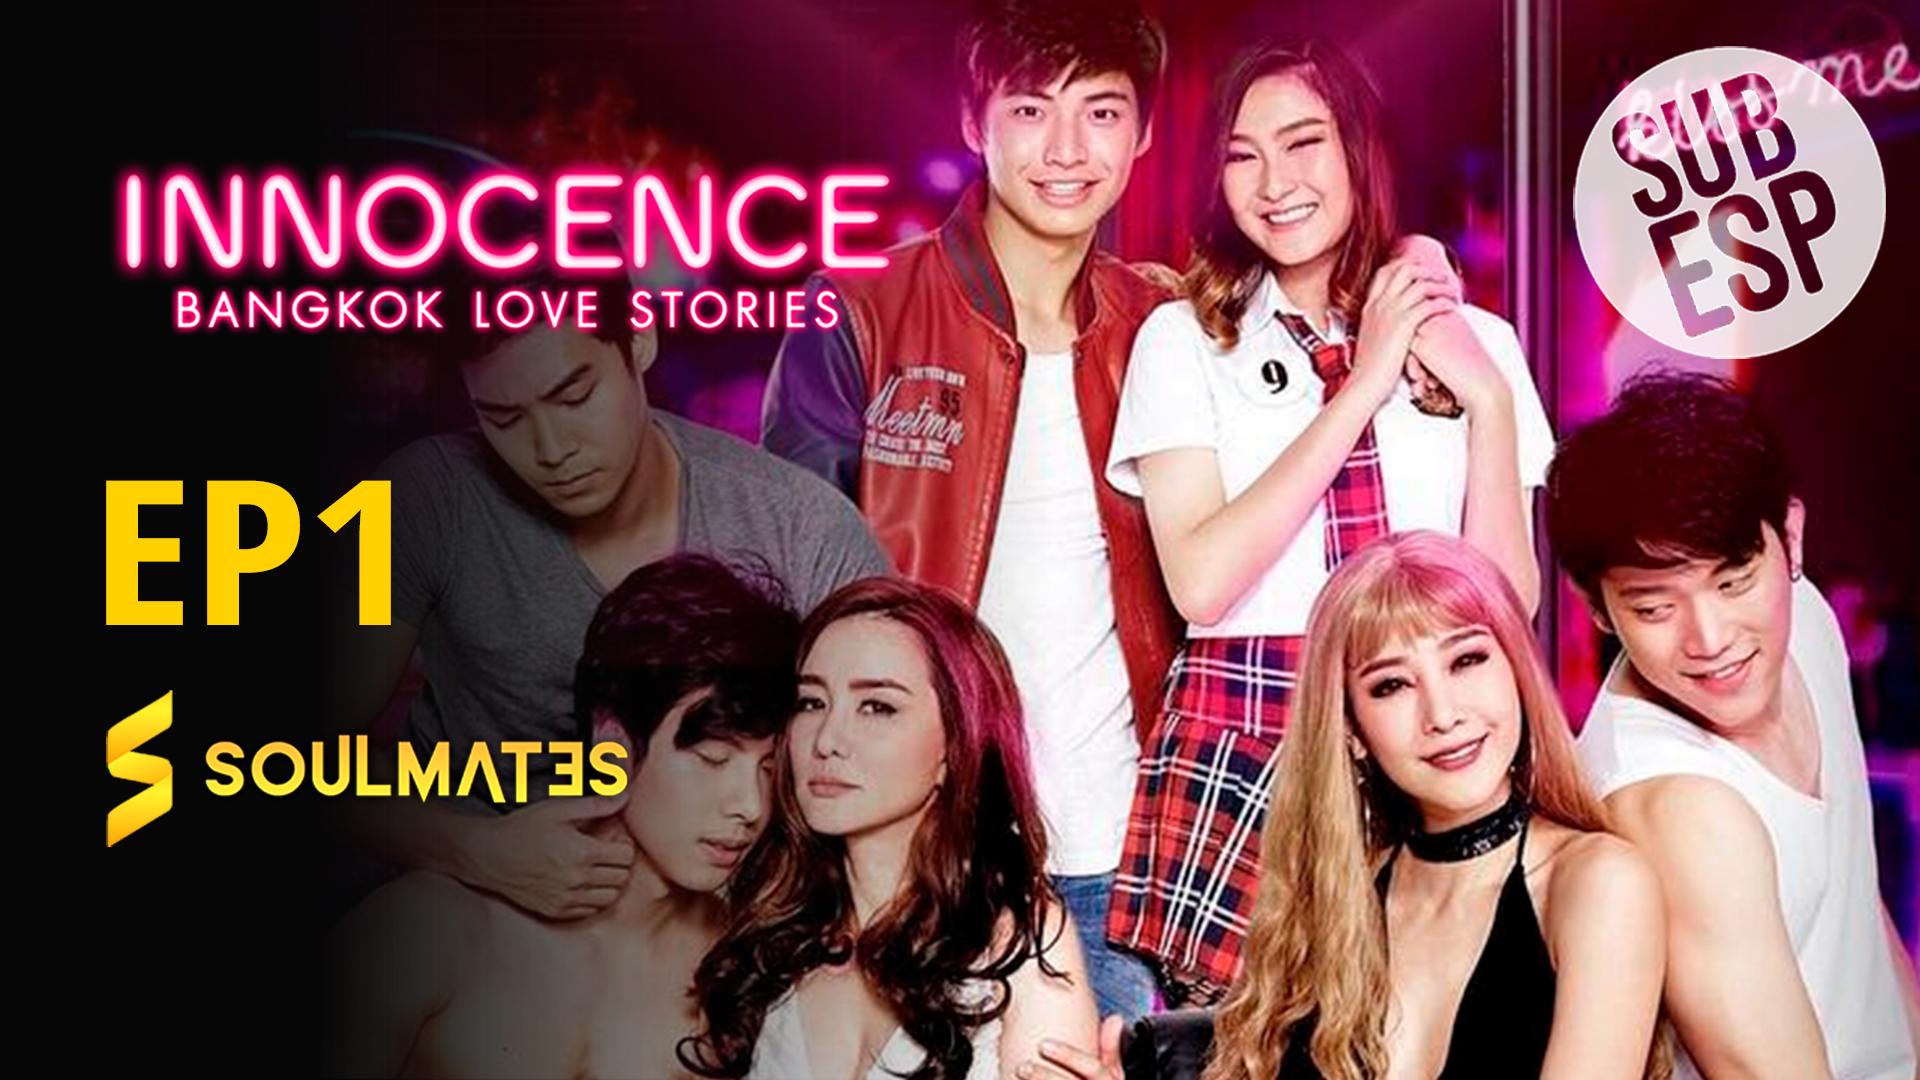 Bangkok Love Stories 2 Innocence : 1×1